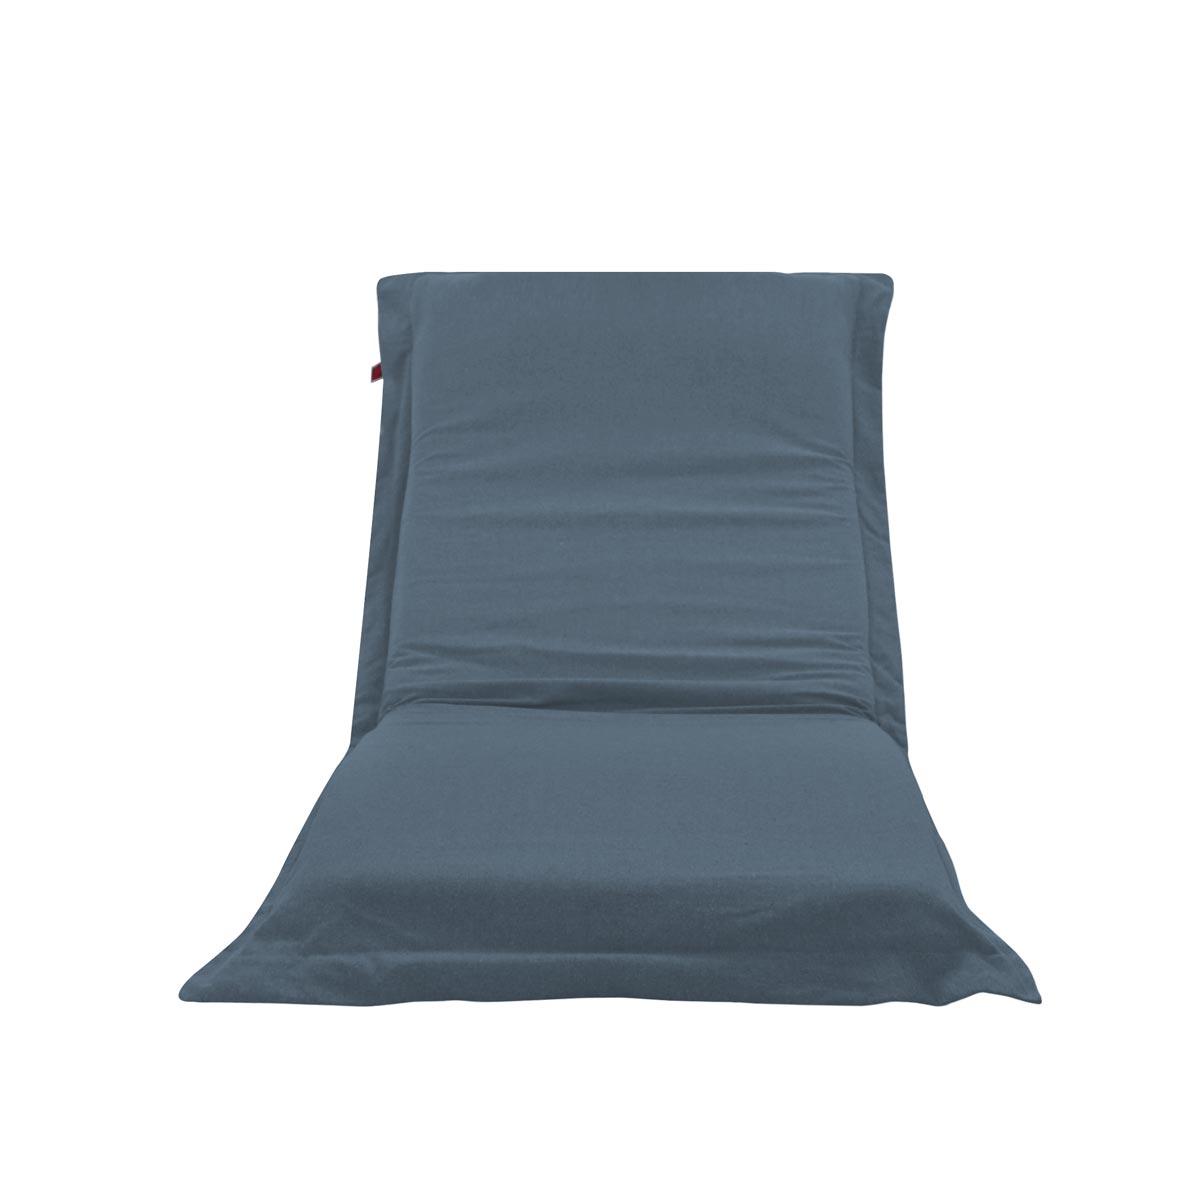 Pufe ClicClac Uno Lounge Tecido Ecolona Jeans Blue 01 02